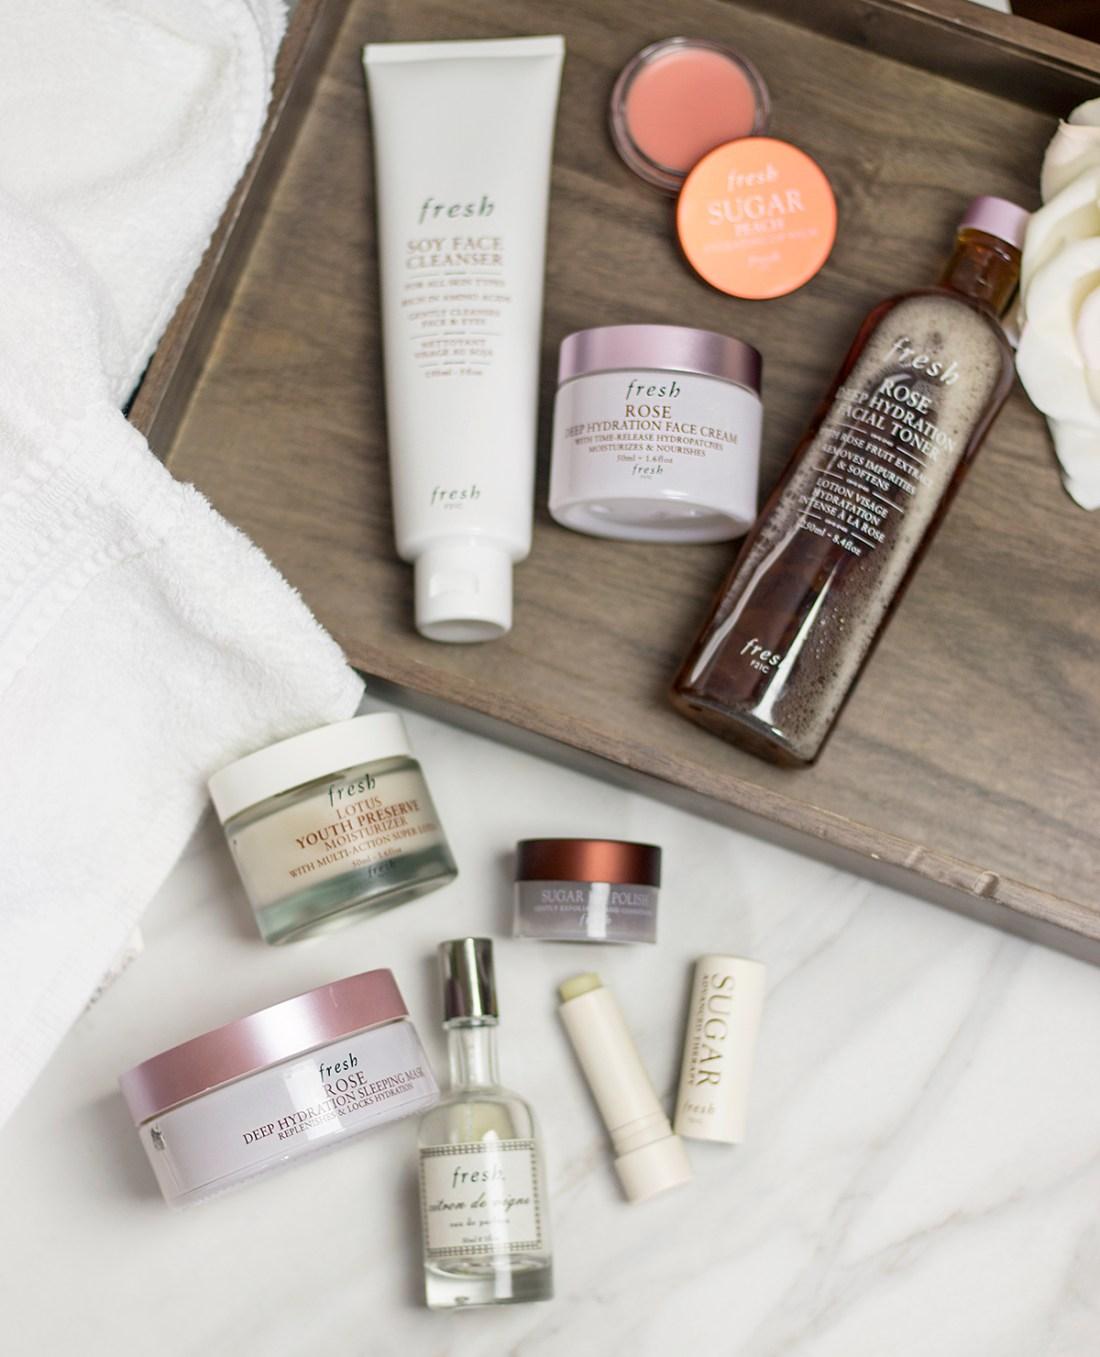 Fresh Beauty Skincare Favorites for Spring | A Good Hue